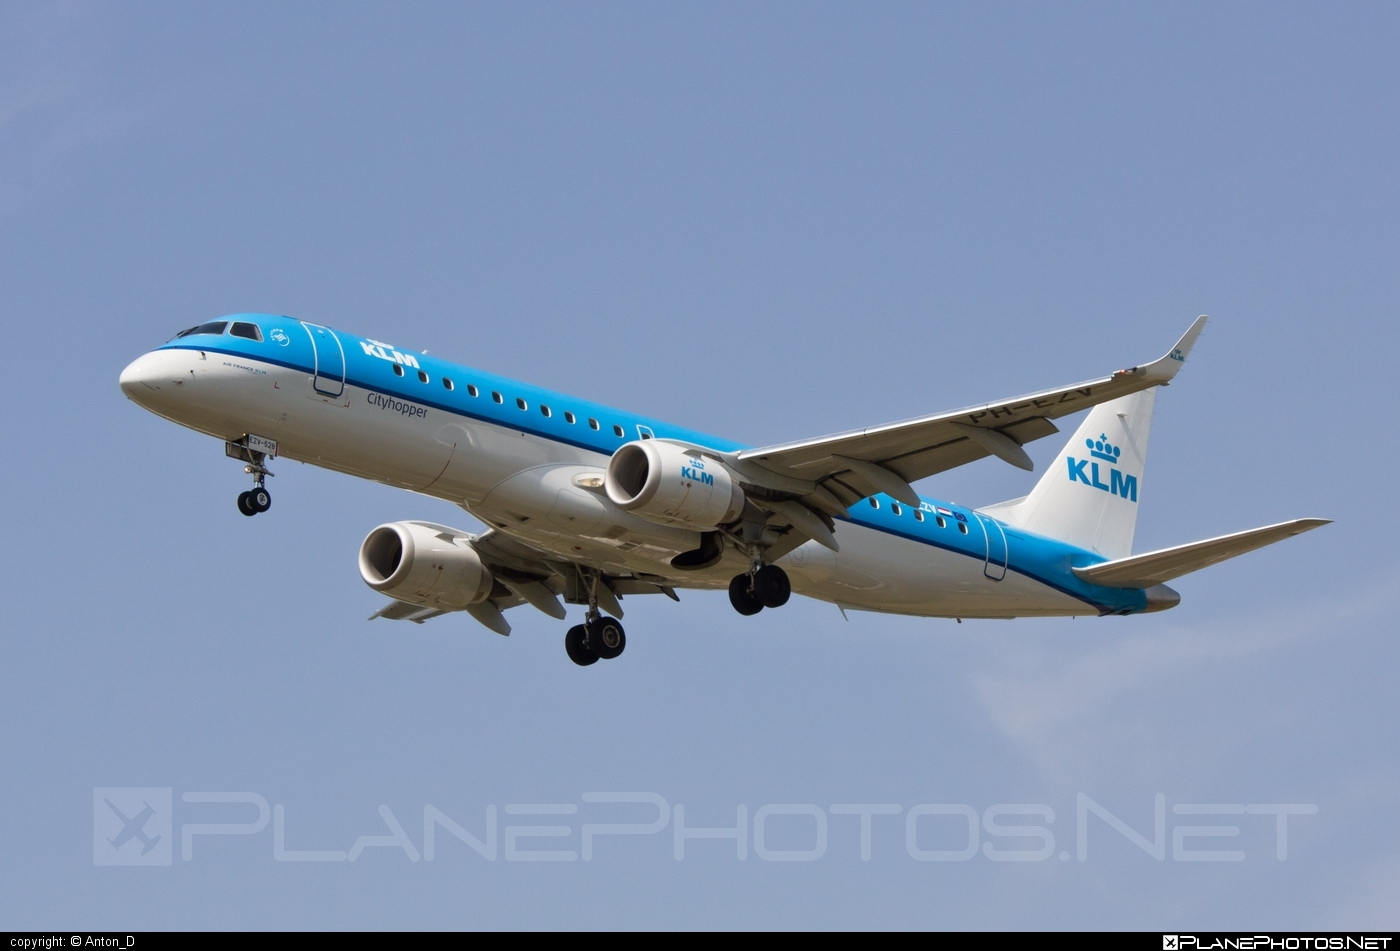 Embraer E190STD (ERJ-190-100STD) - PH-EZV operated by KLM Cityhopper #e190 #e190100 #e190100std #e190std #embraer #embraer190 #embraer190100std #embraer190std #klm #klmcityhopper